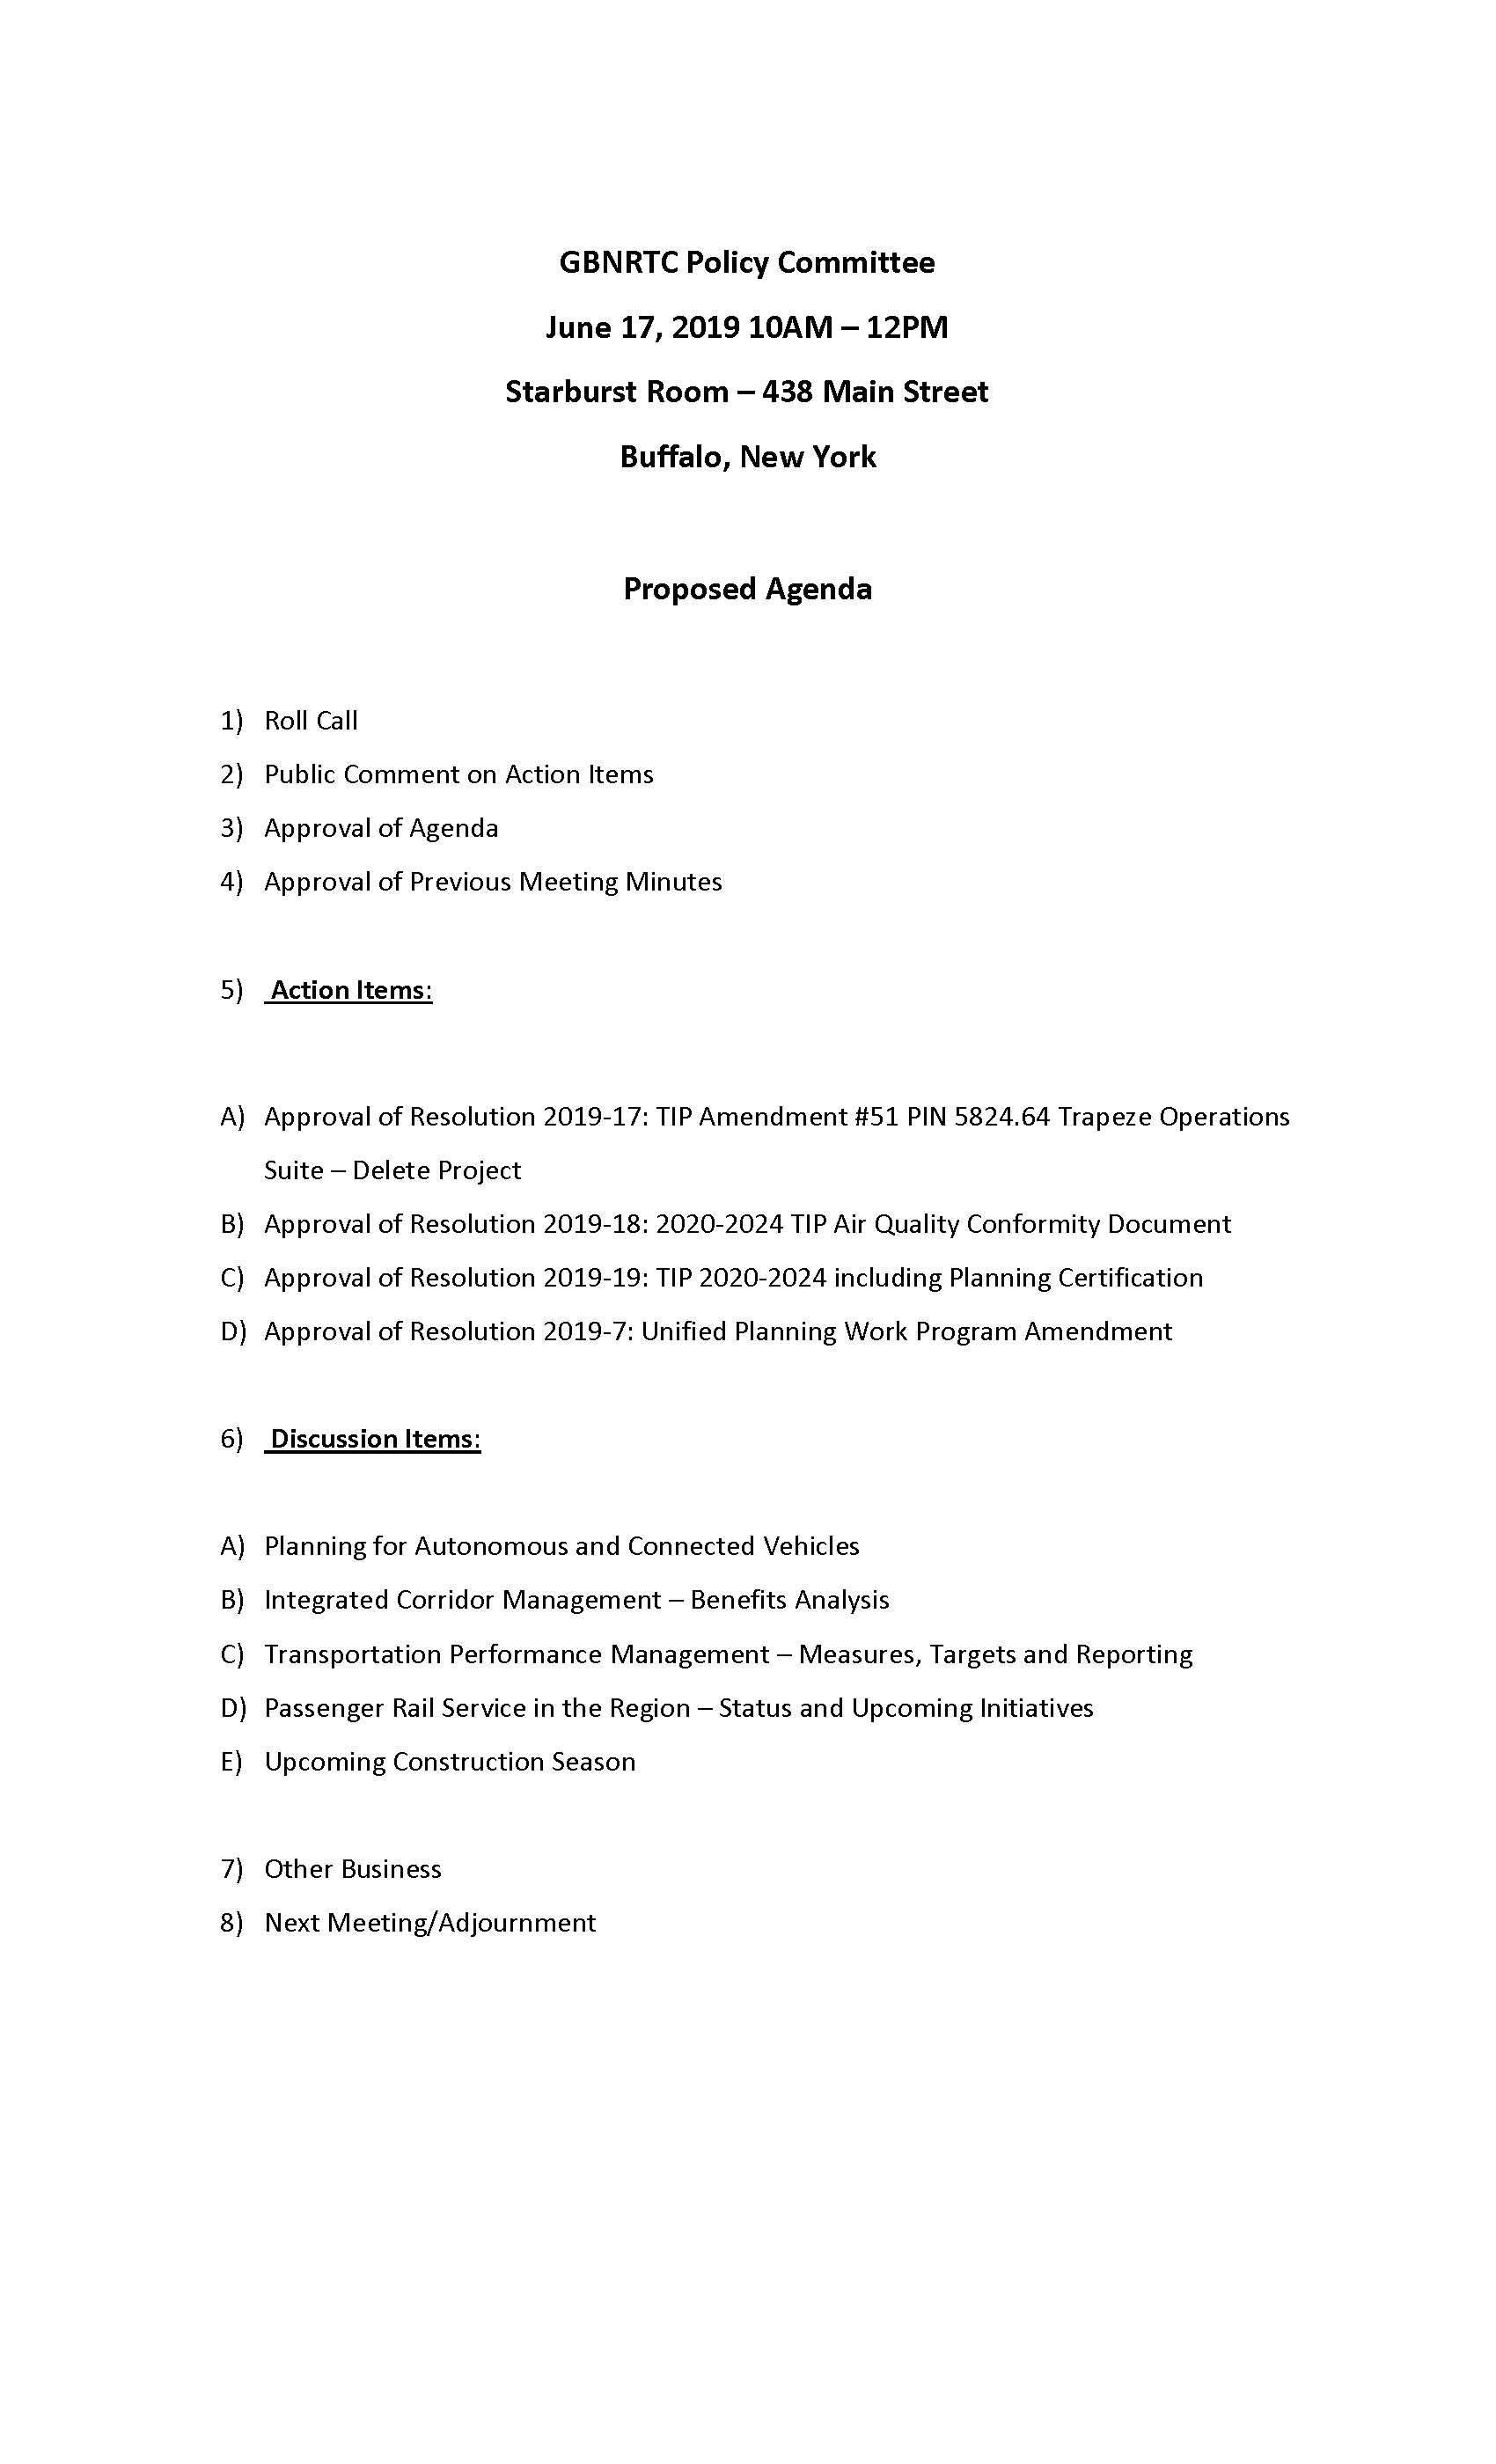 June 17, 2019 Policy Committee Agenda.jpg